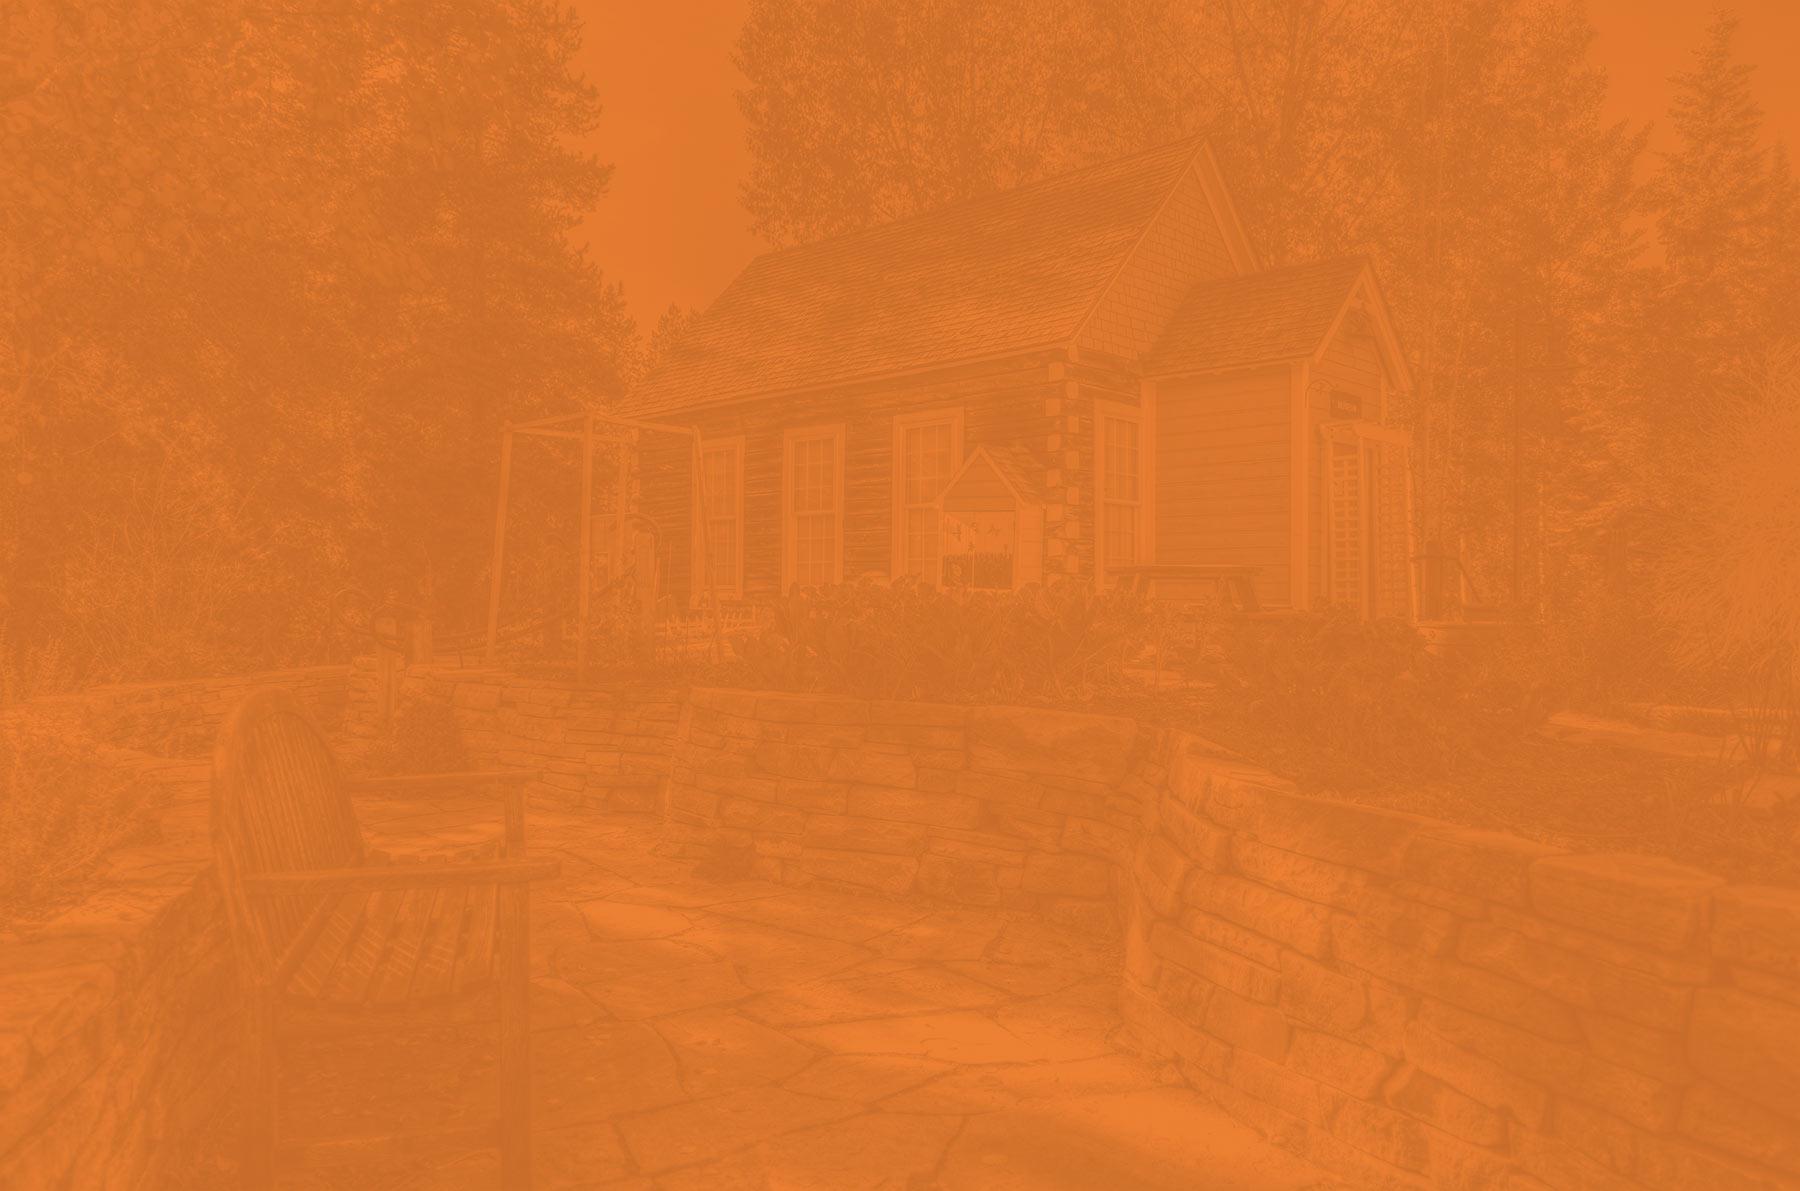 Backyard Cottage Orange Overlay-2.jpg